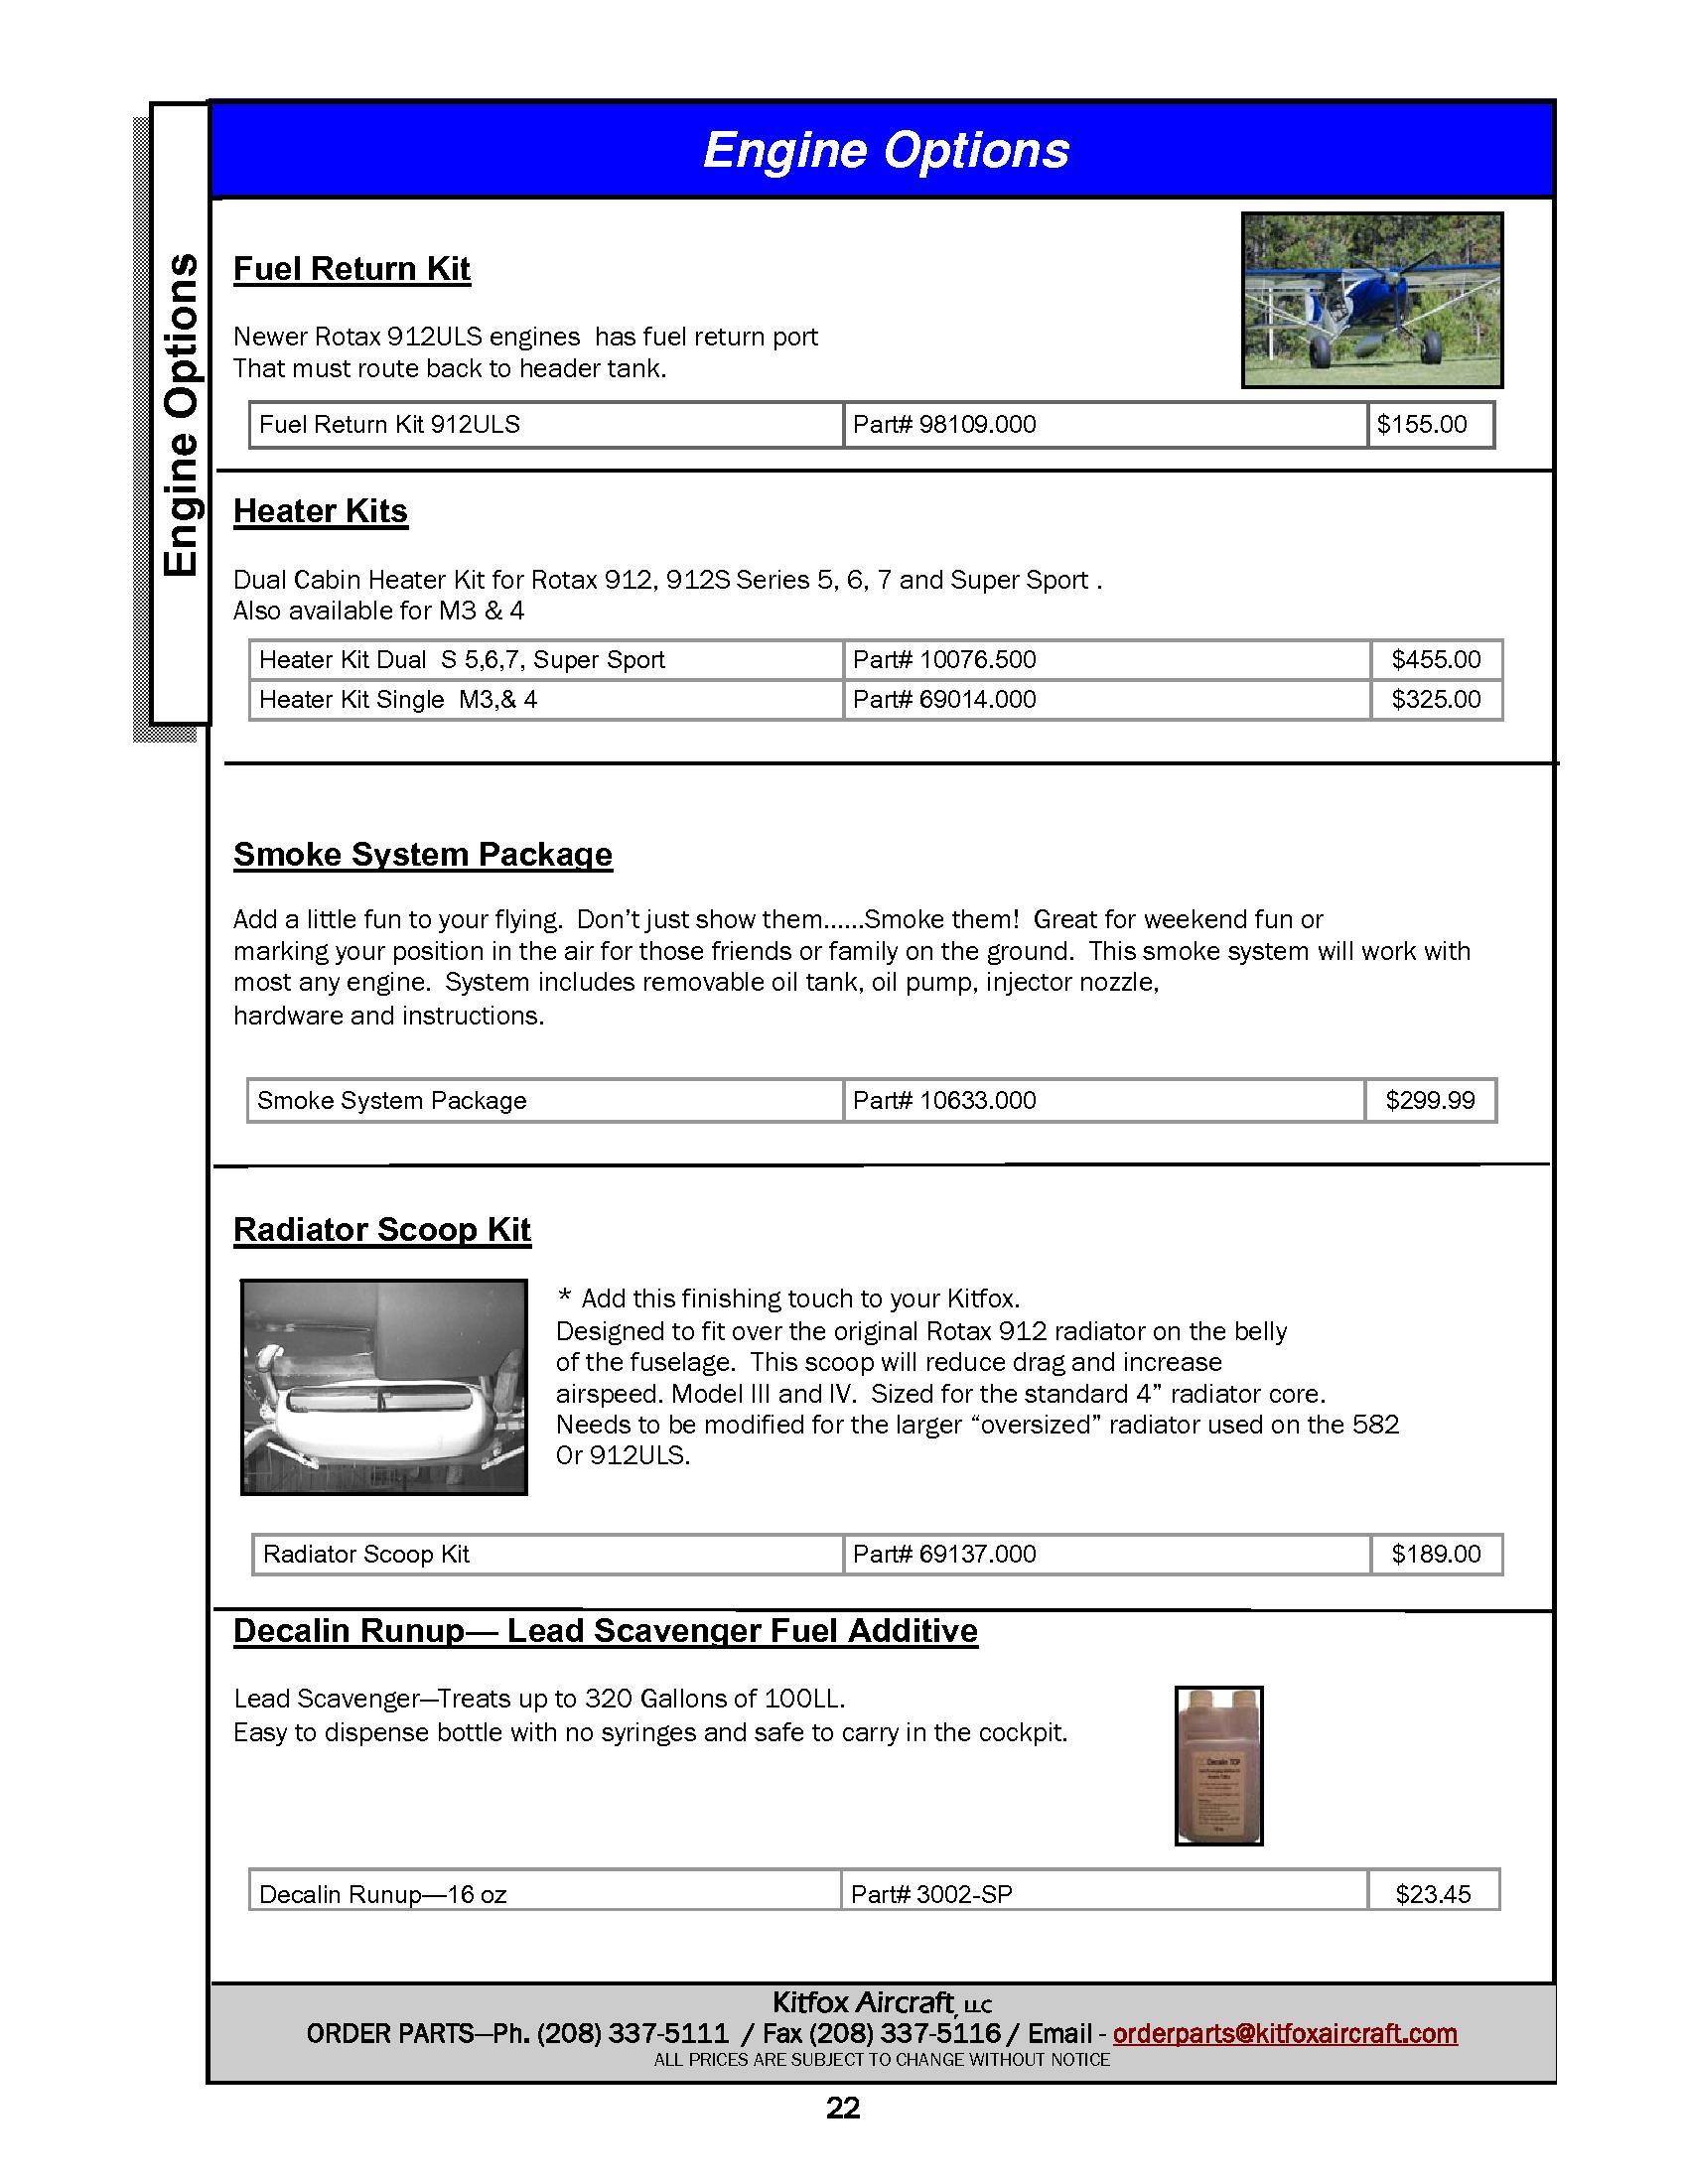 3240 Cub Cadet Wiring Diagram Diagrams Tank Rotax 912 Schematic Lt1050 Electrical